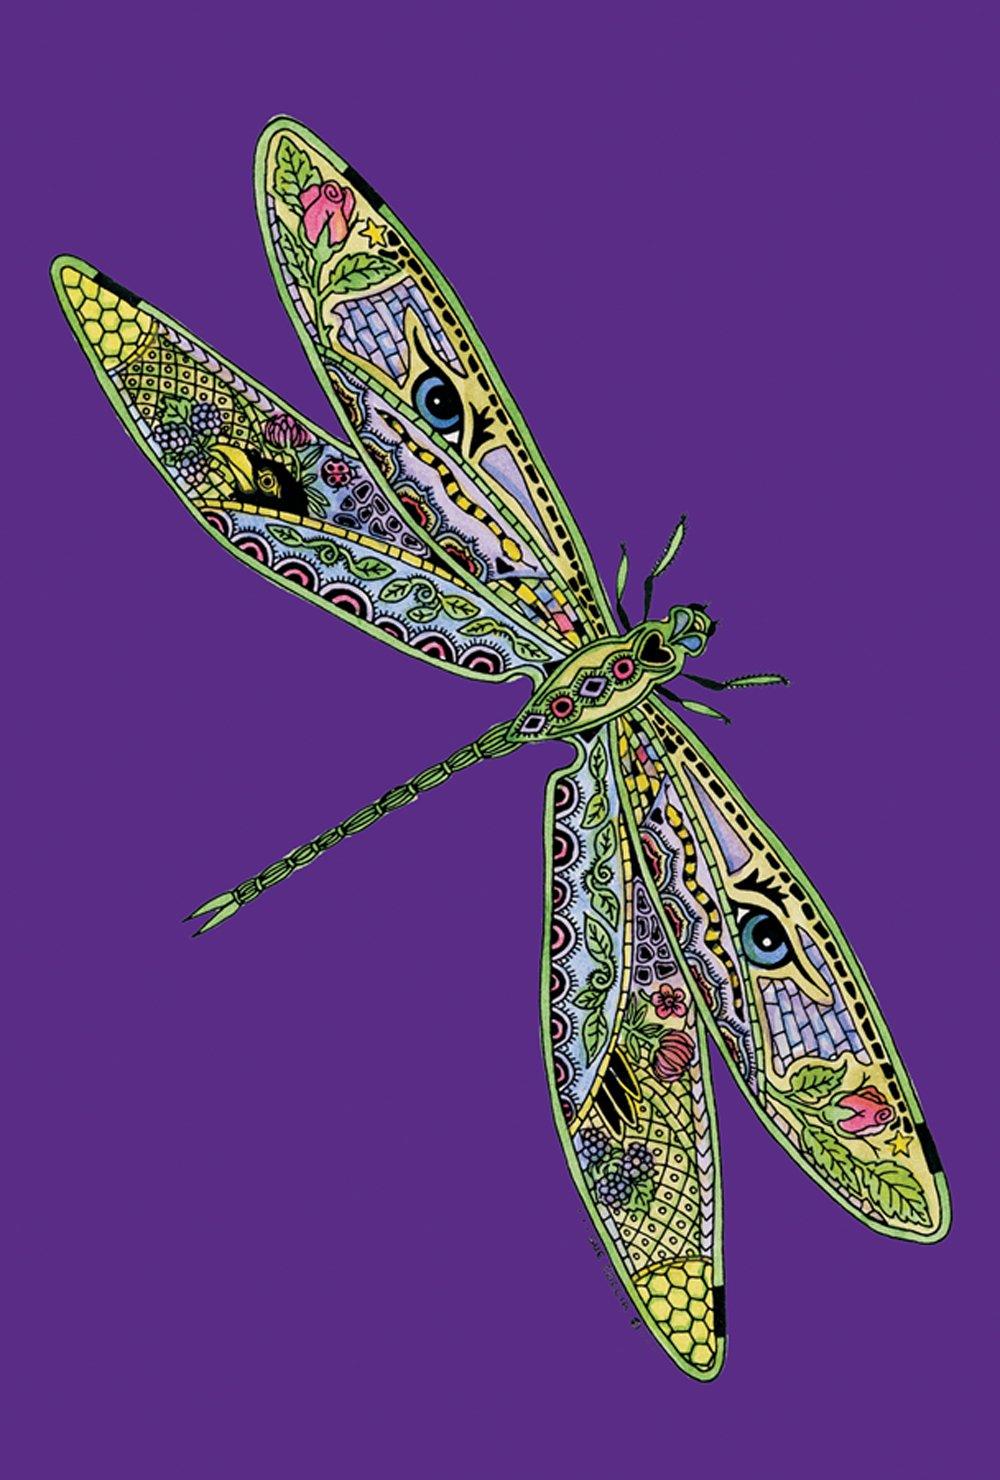 Toland Home Garden Animal Spirits Dragonfly 12.5 x 18 Inch Decorative Native Spiritual Flying Insect Garden Flag